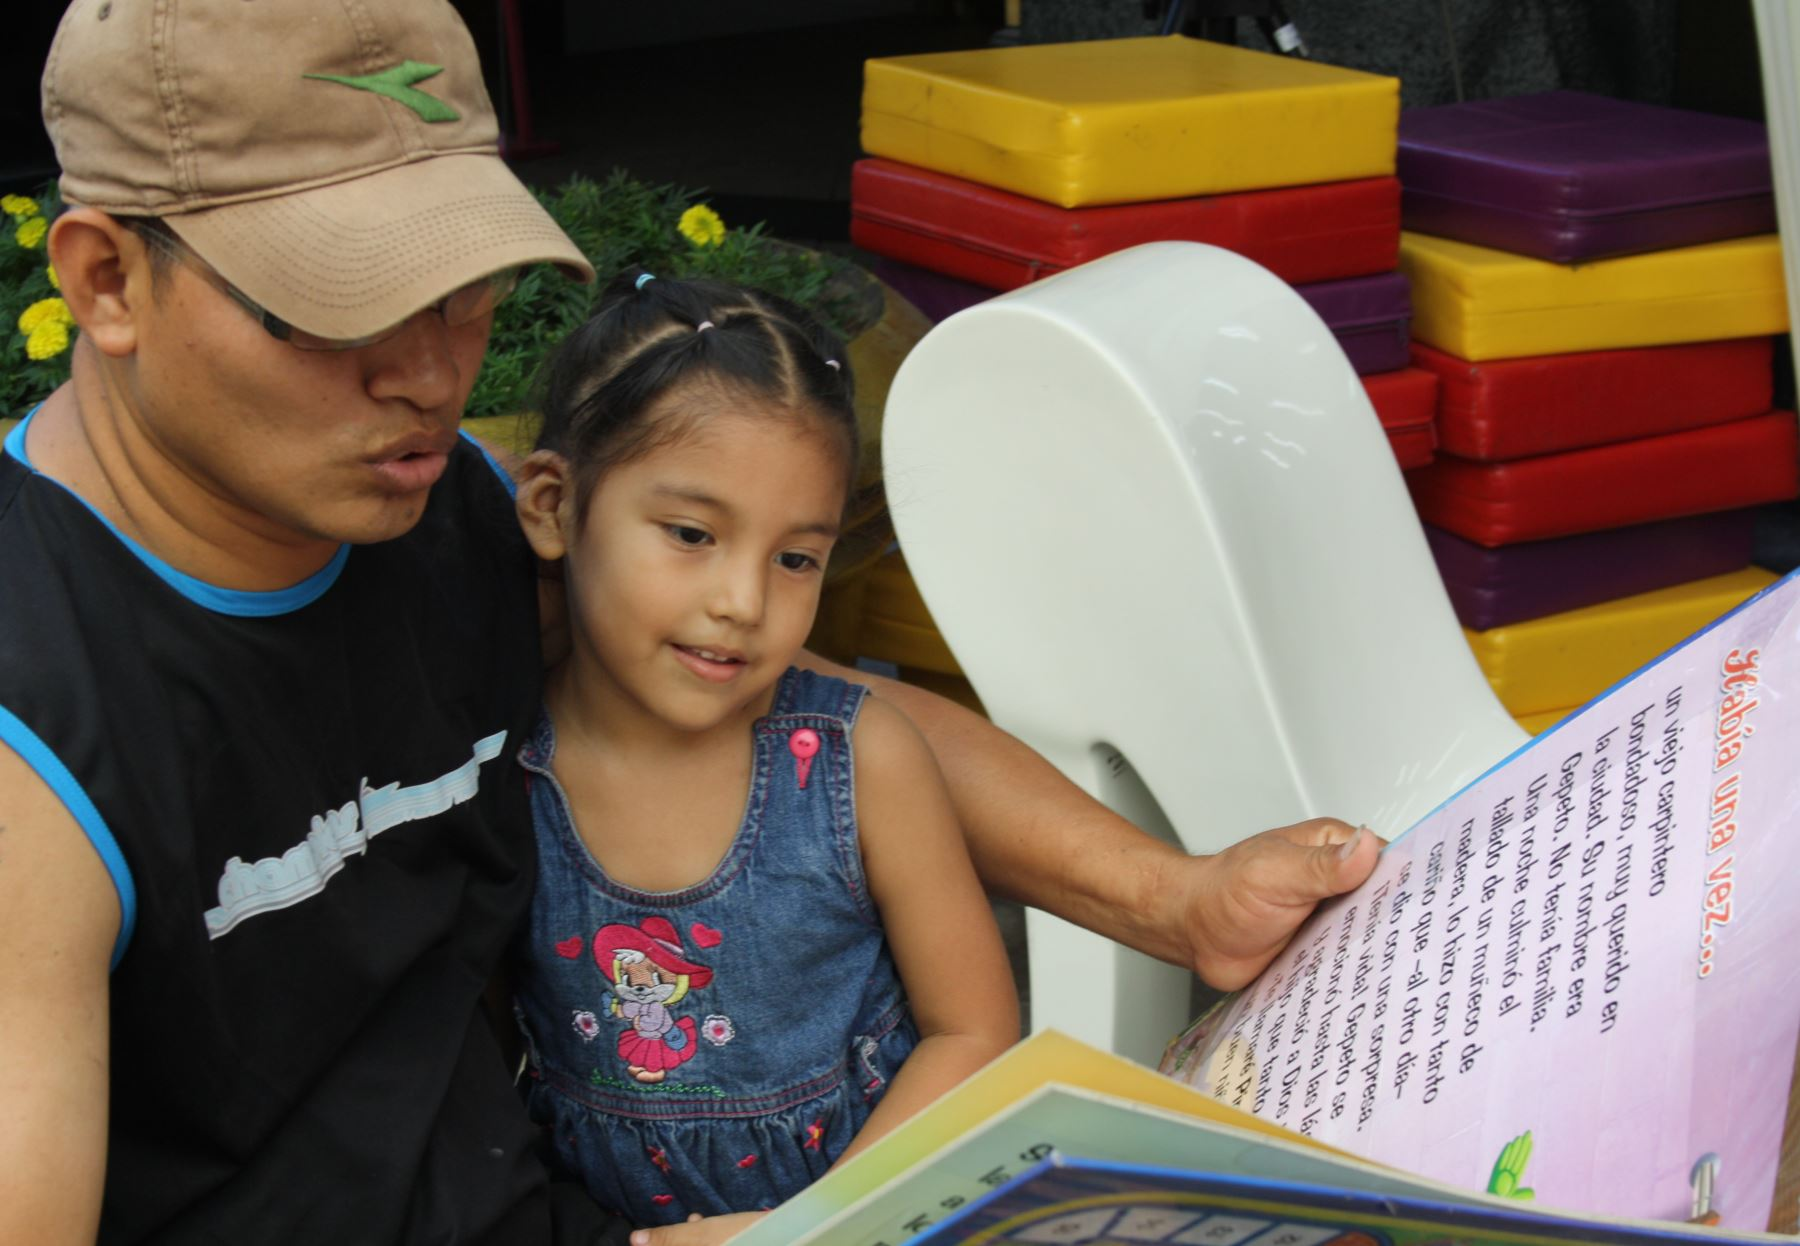 Ministro de Educación exhorta a padres de familia a aprender a escuchar a sus hijos